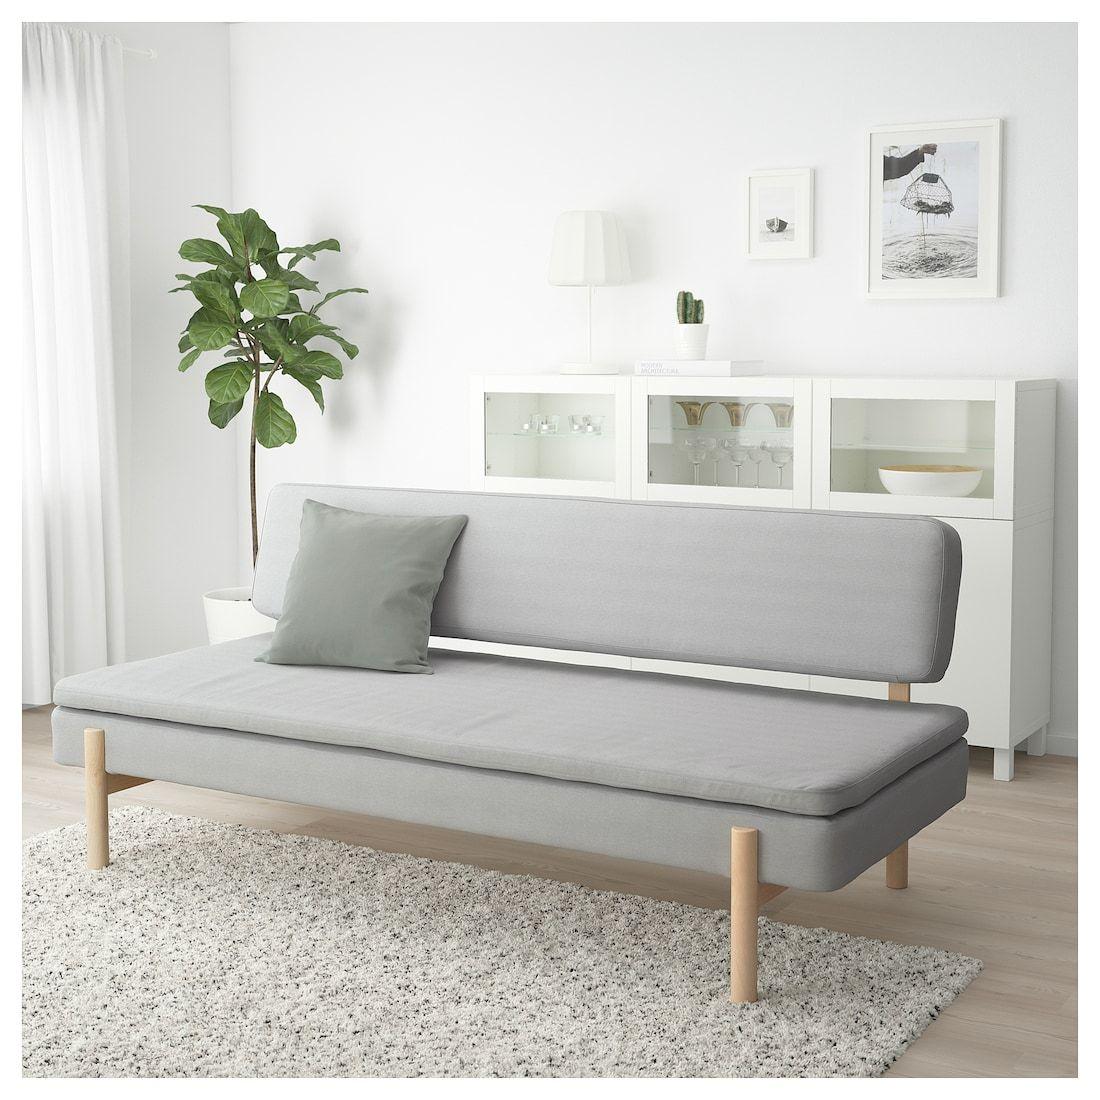 Ypperlig Canape Lit 3 Places Orrsta Gris Clair Ikea Matelas A Ressorts